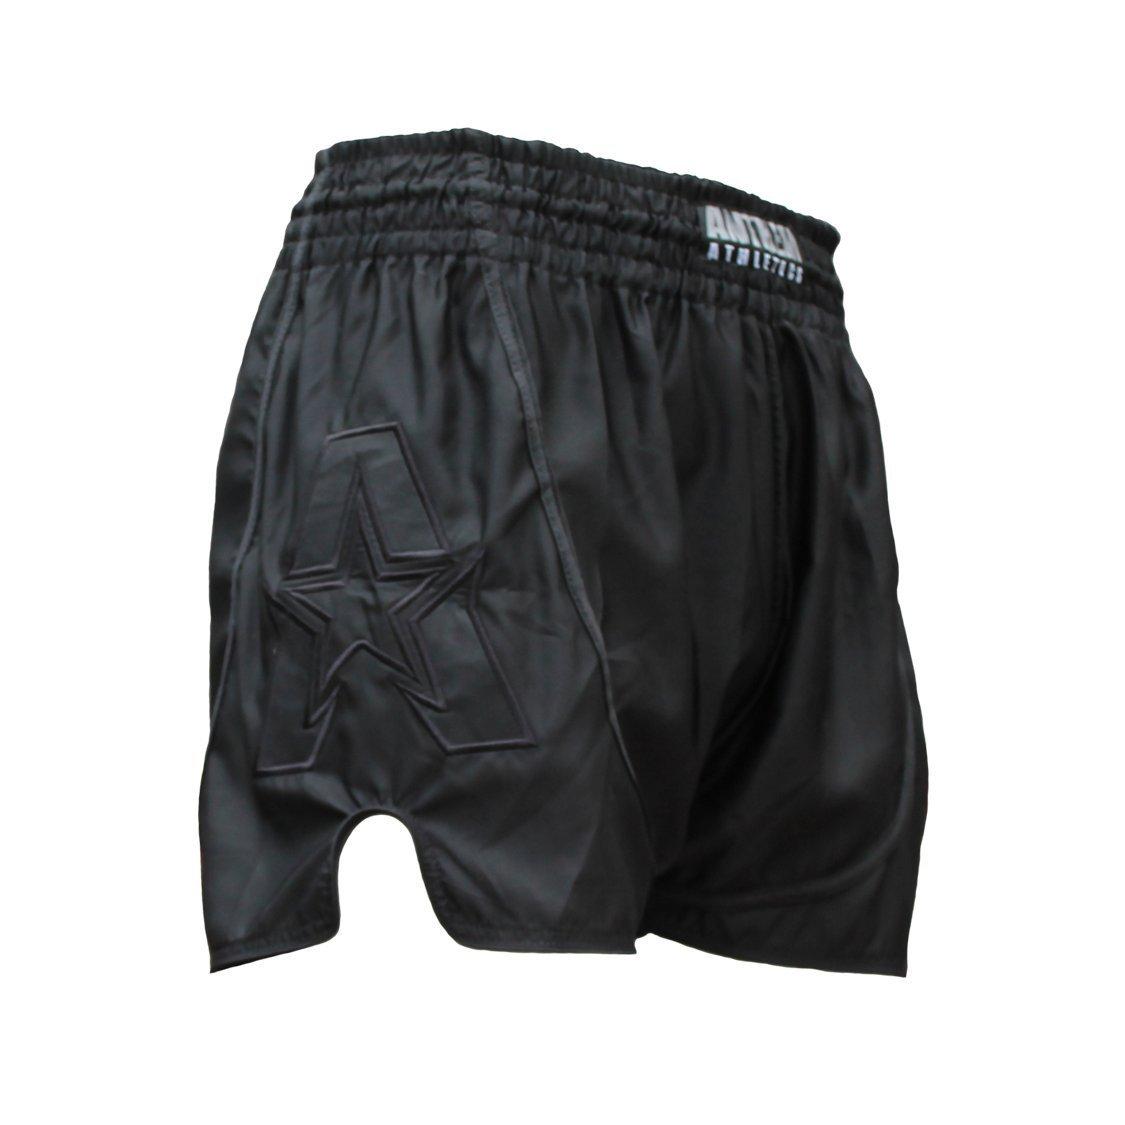 Anthem Athletics Infinity Muay Thai Shorts - 20+ Styles - Kickboxing, Thai Boxing - Black - XXX-Large